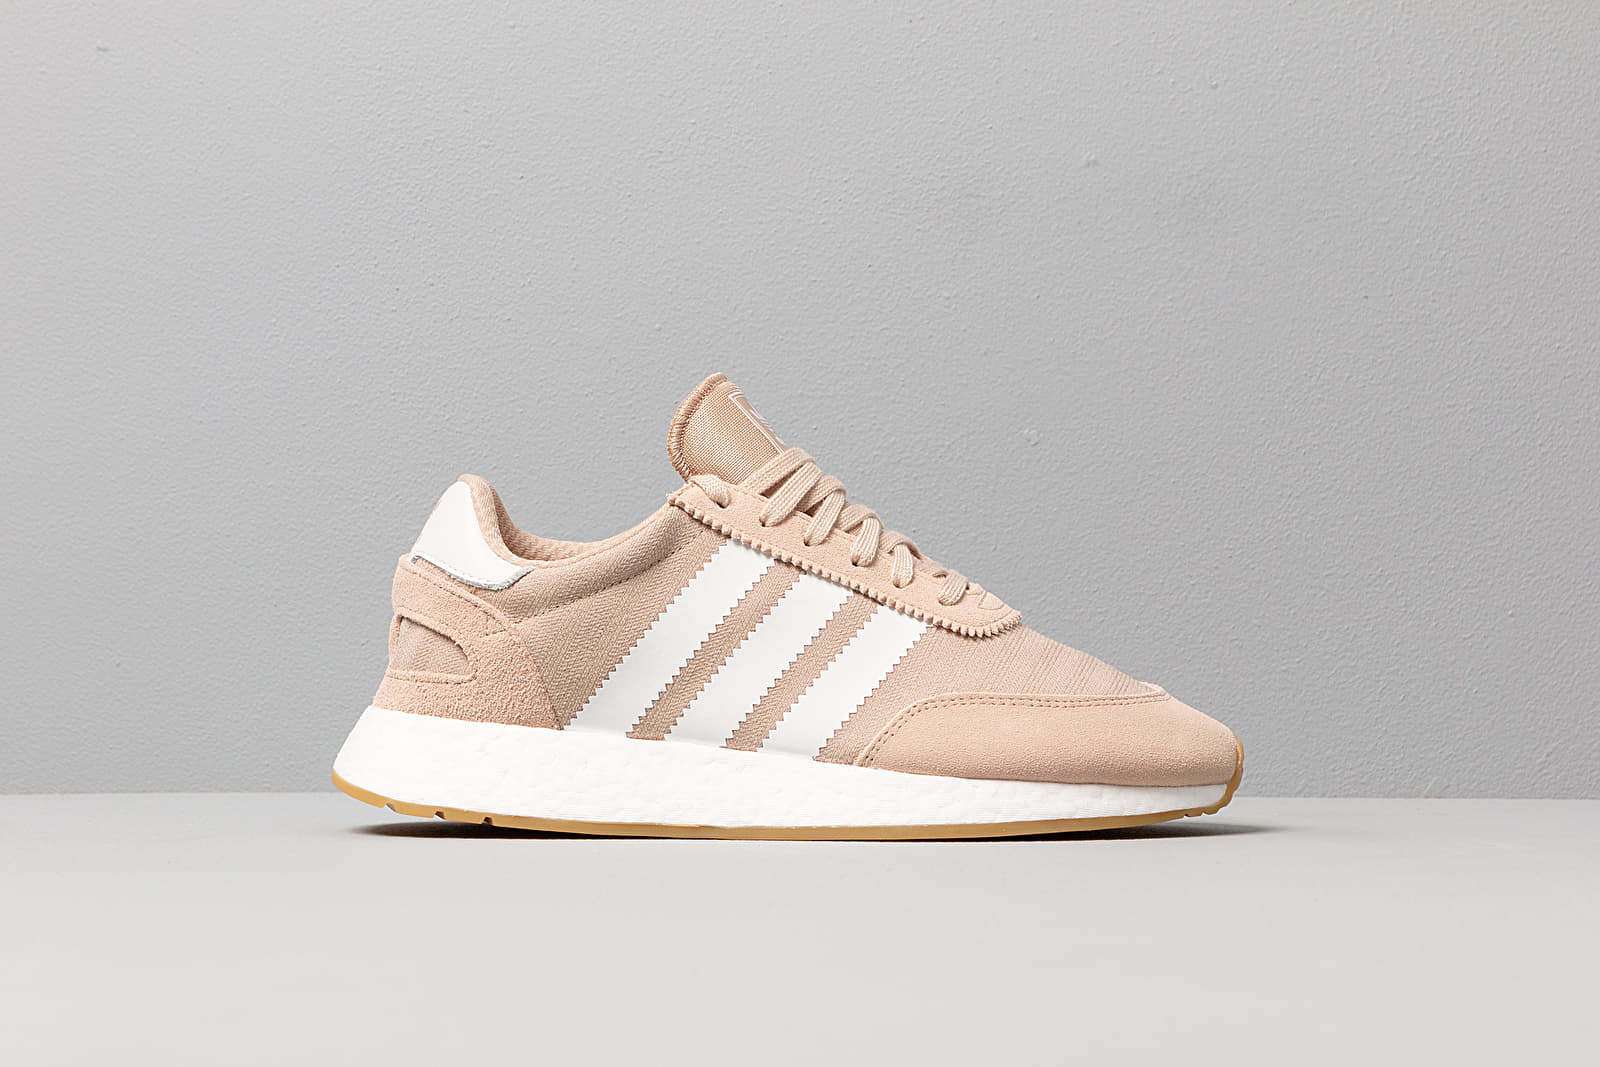 Men's shoes adidas I-5923 St Pale Nude